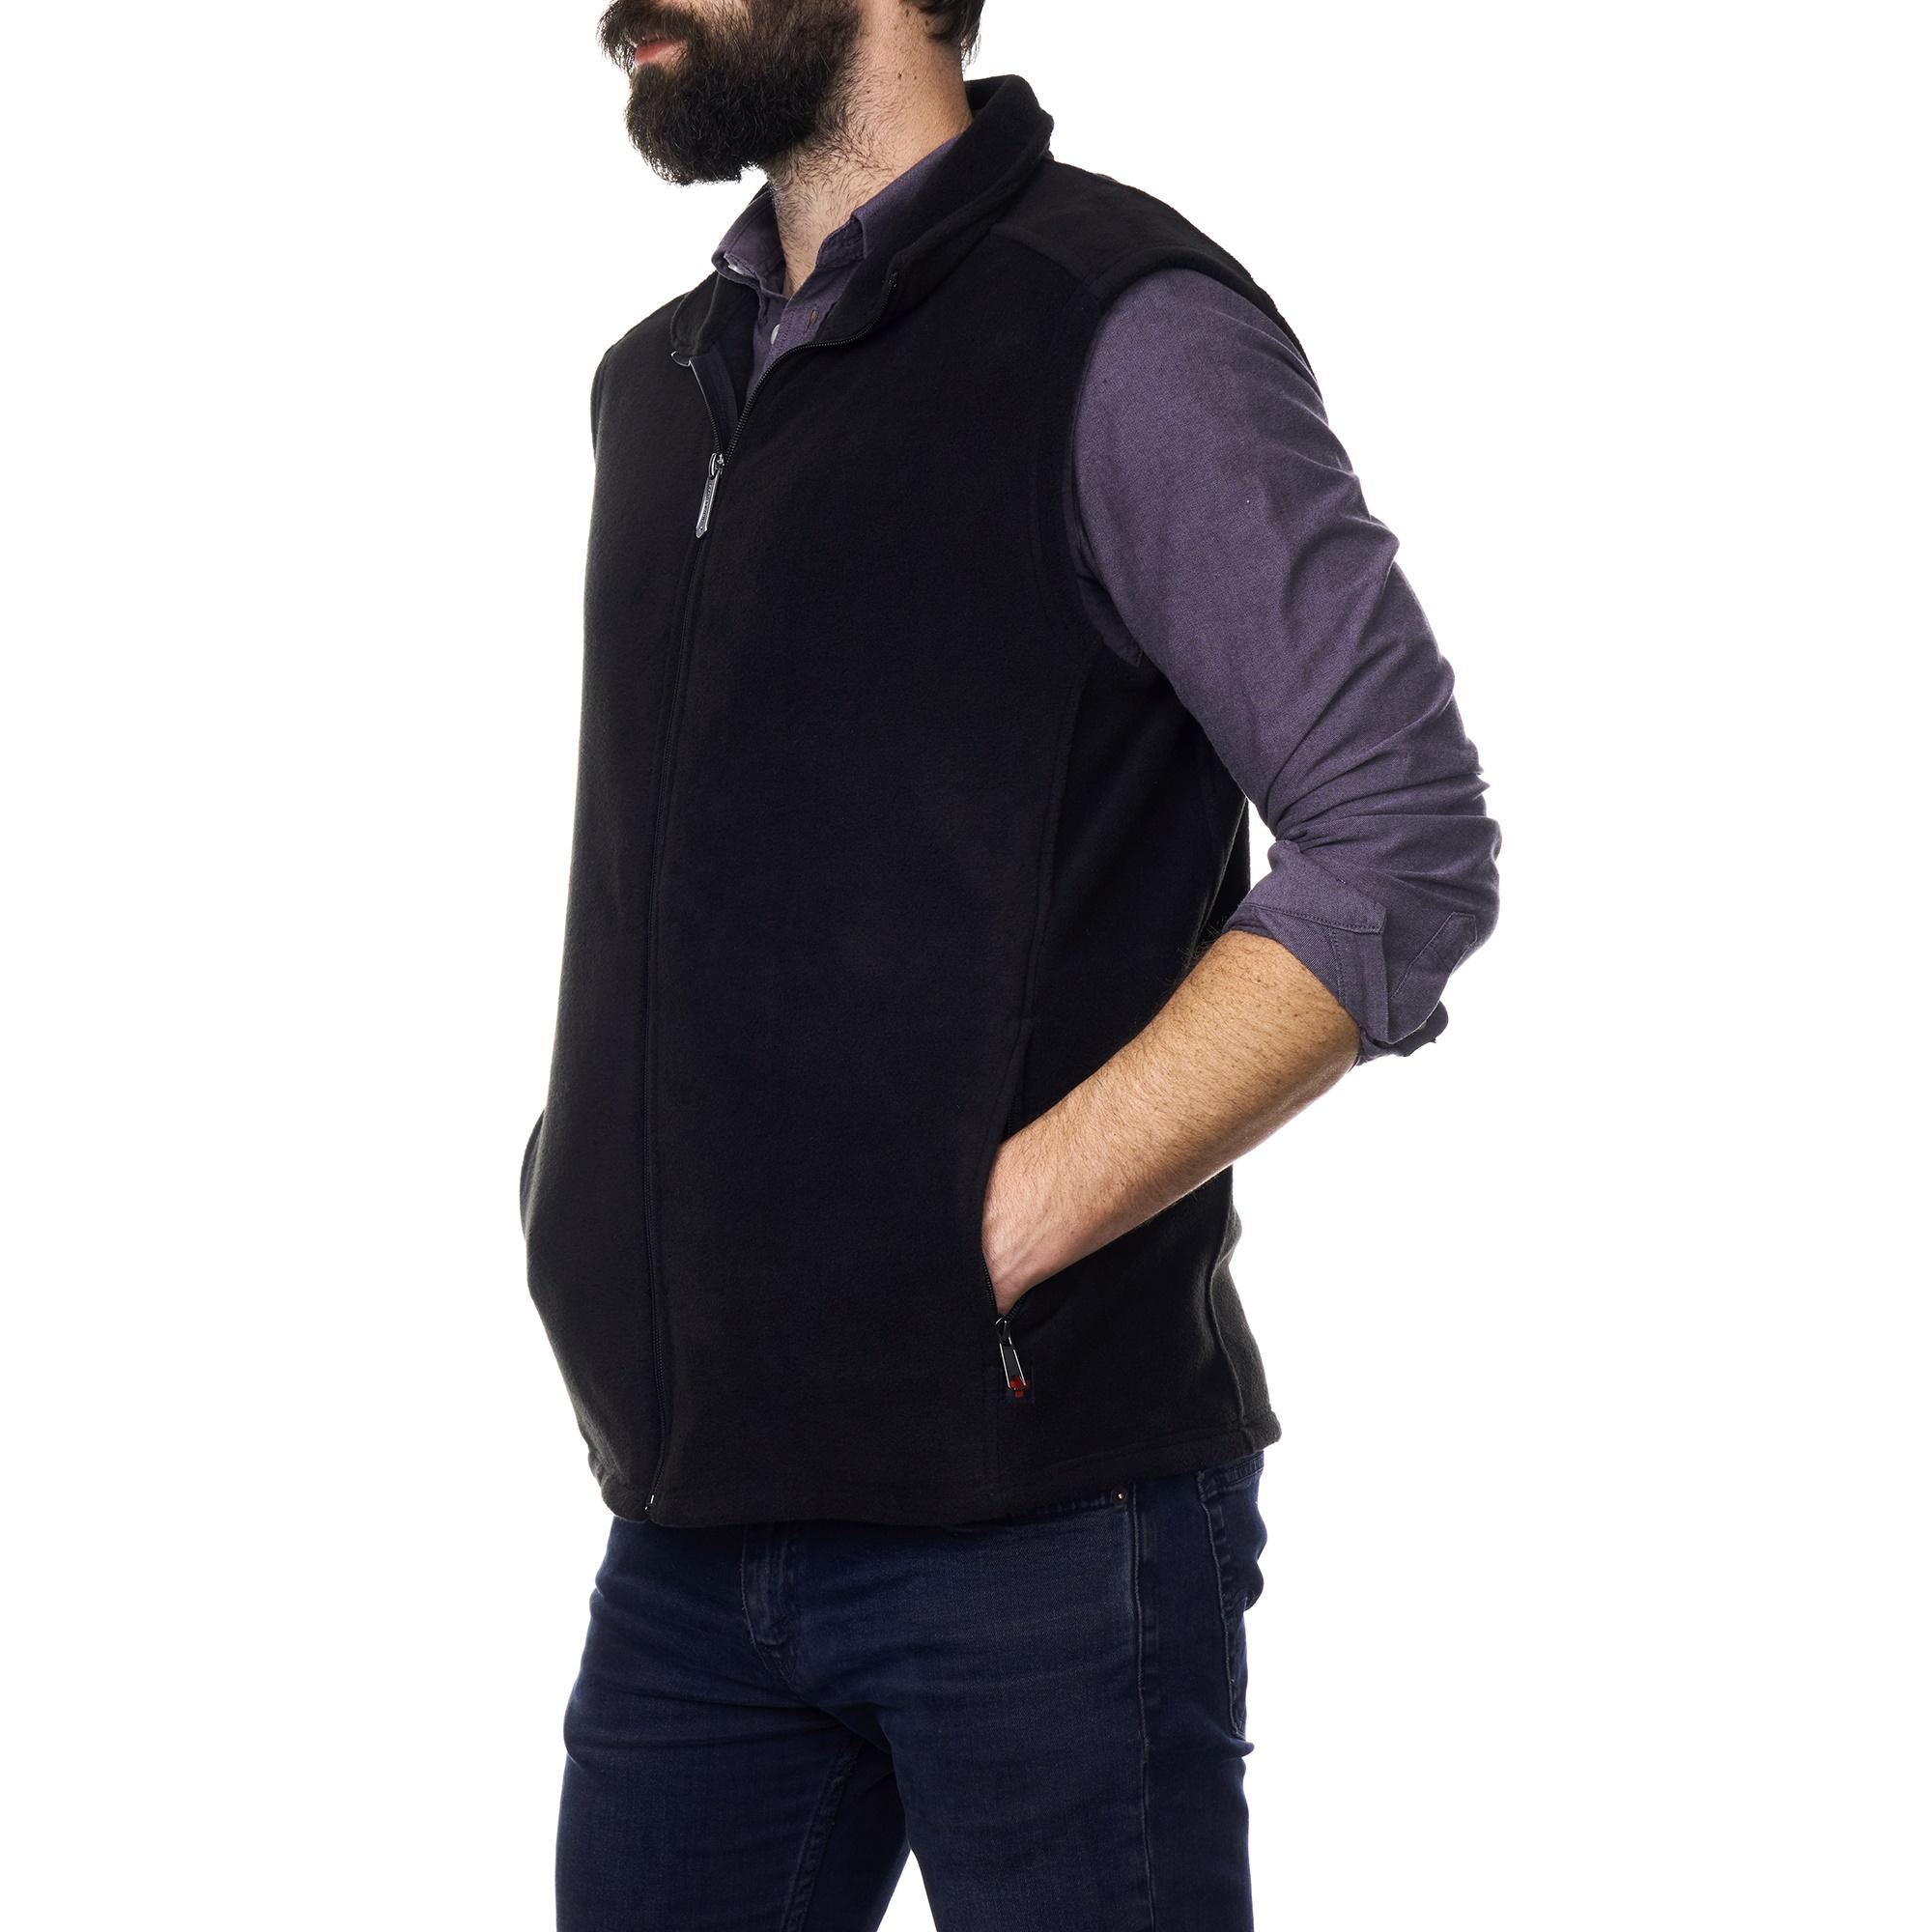 Alpine-Swiss-Mens-Full-Zip-Up-Fleece-Vest-Lightweight-Warm-Sleeveless-Jacket thumbnail 14